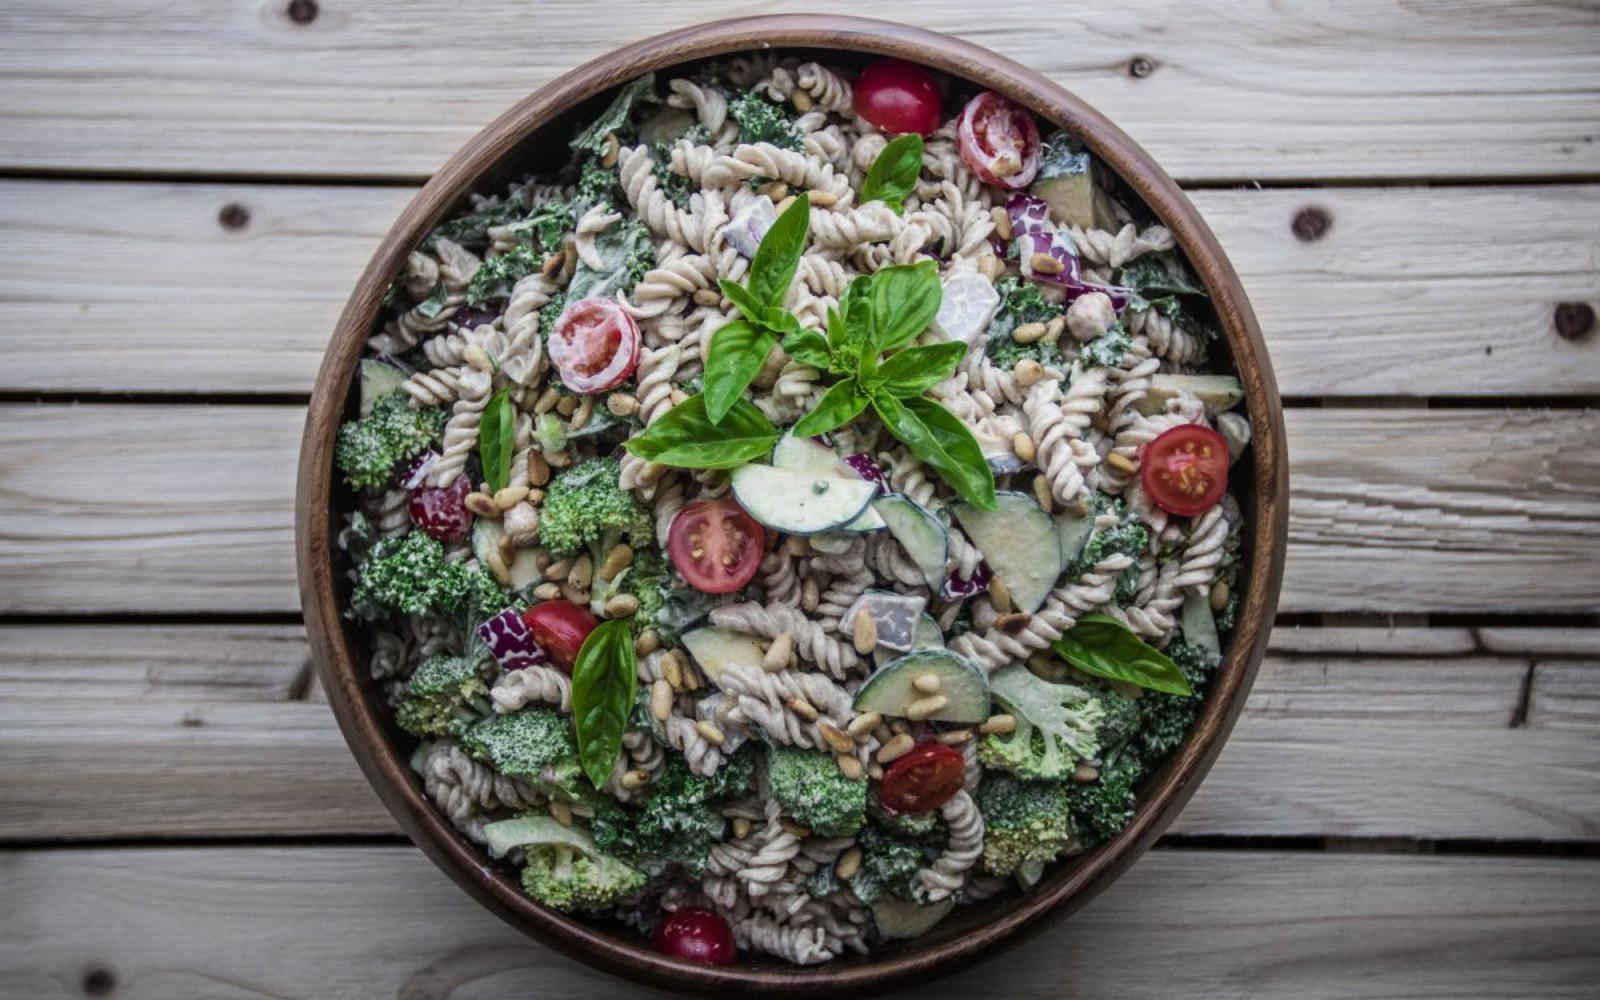 Garden Picnic Pasta Salad